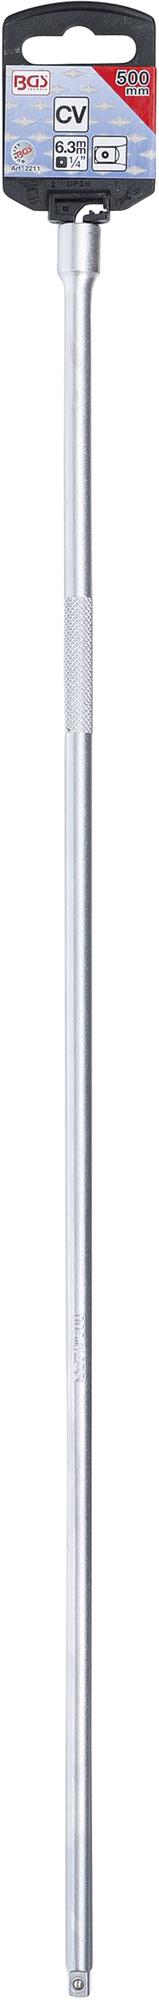 "BGS 2211 Verlängerung 6,3mm (1/4"") Länge 500mm"